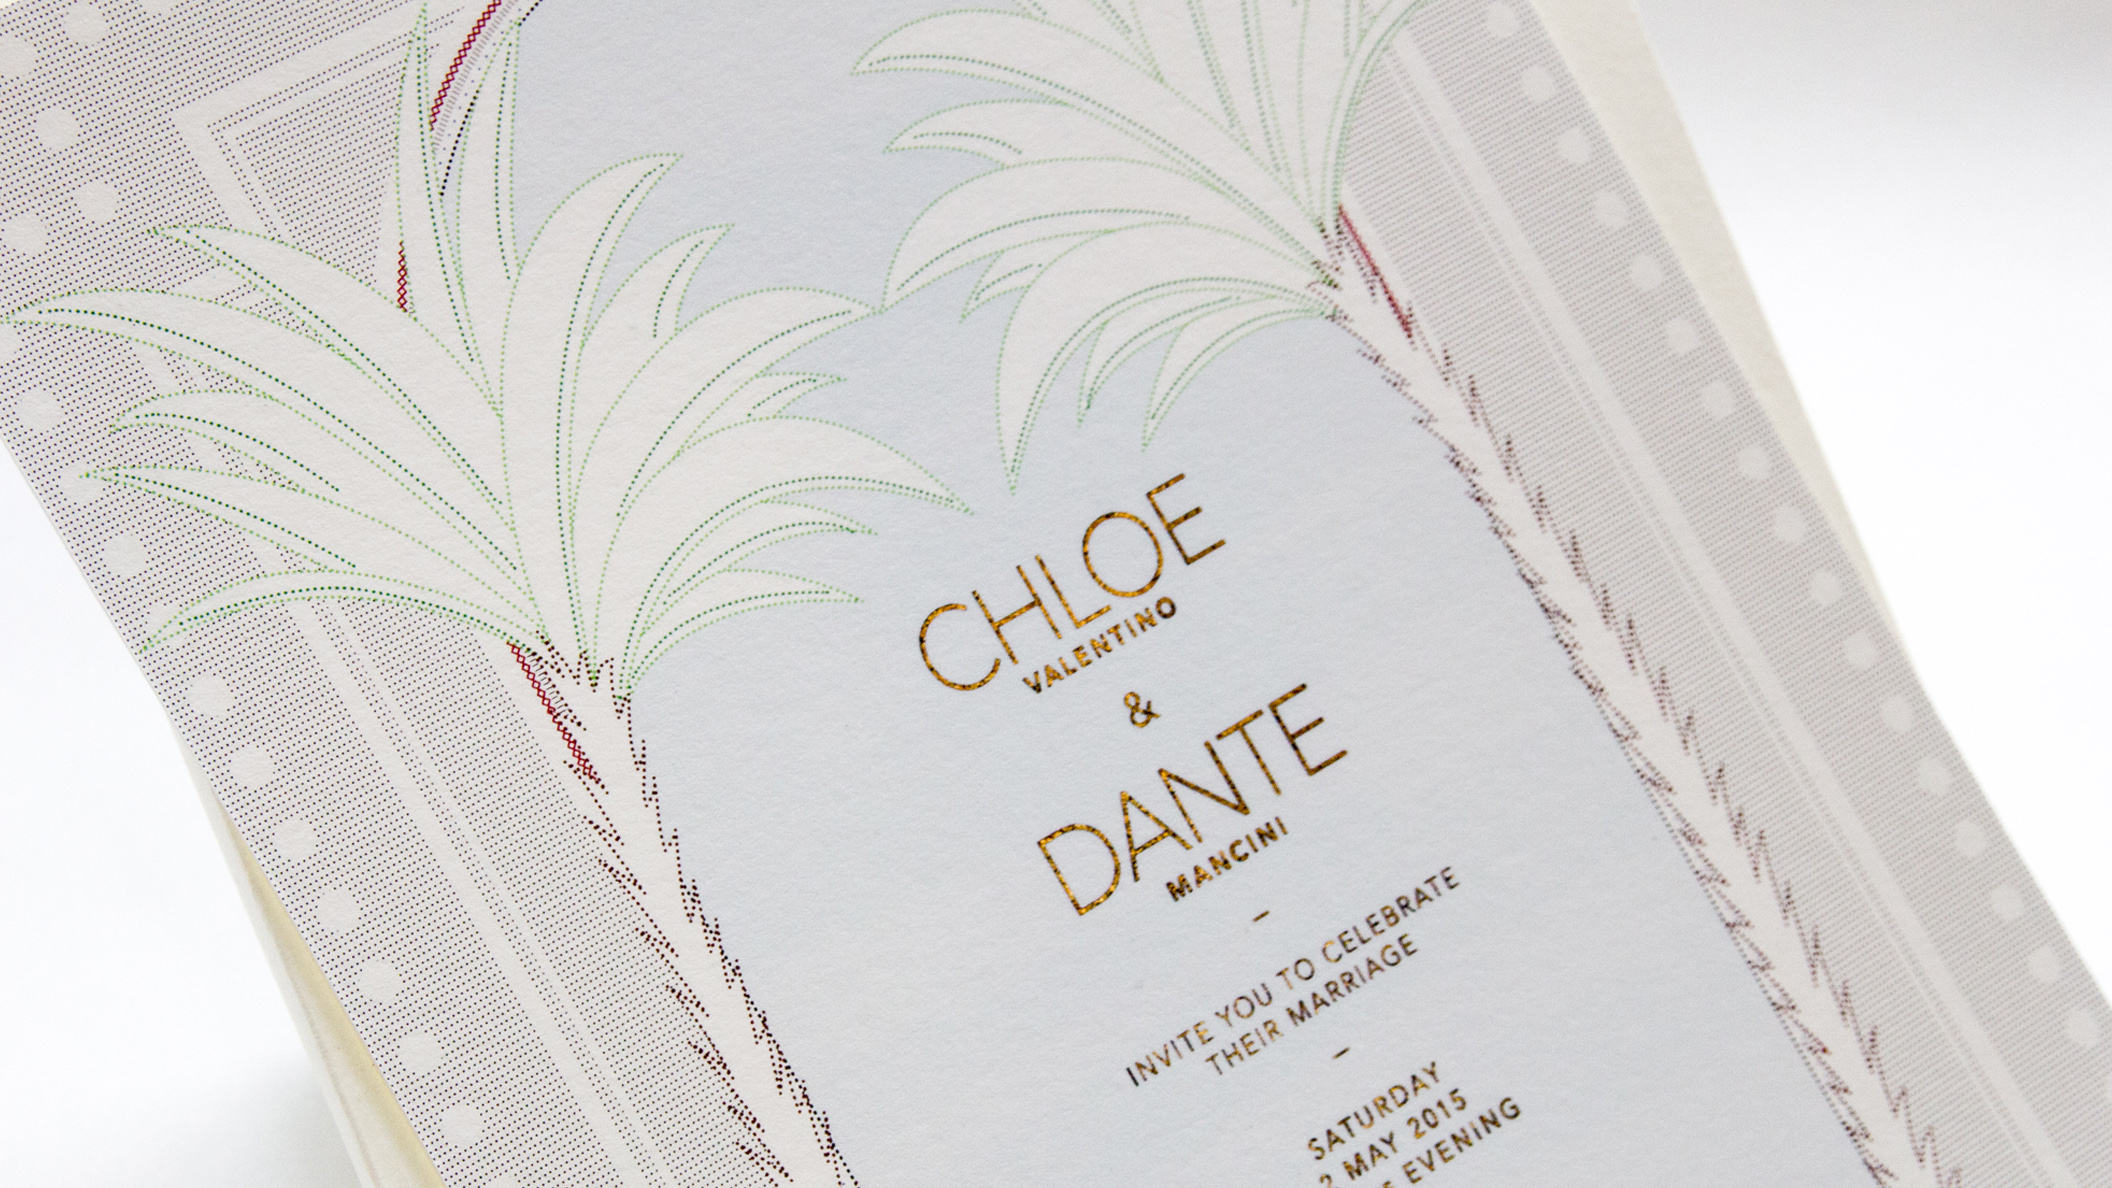 EPHEMERA: CHLOE & DANTE'S WEDDING